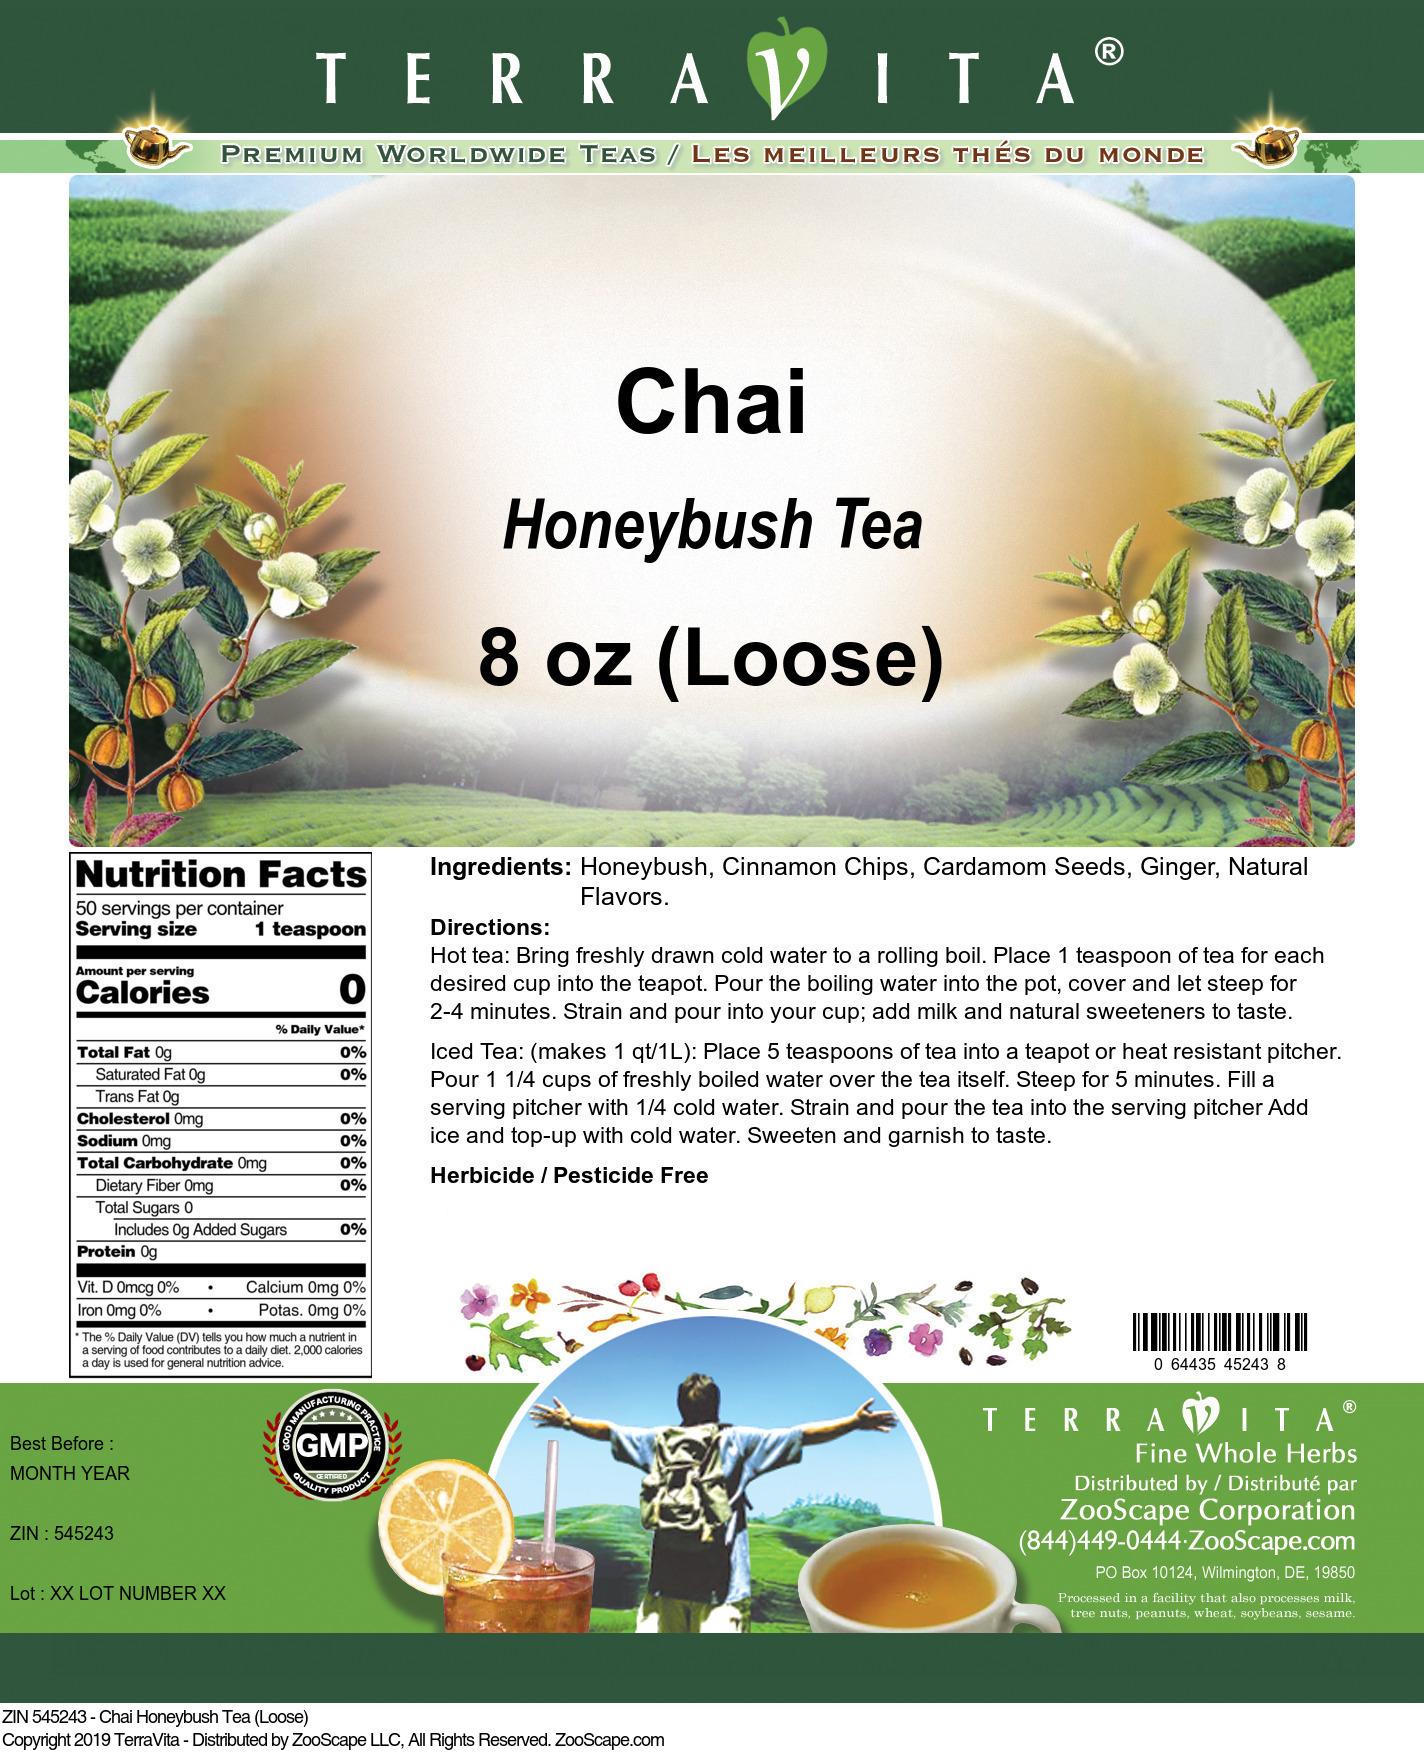 Chai Honeybush Tea